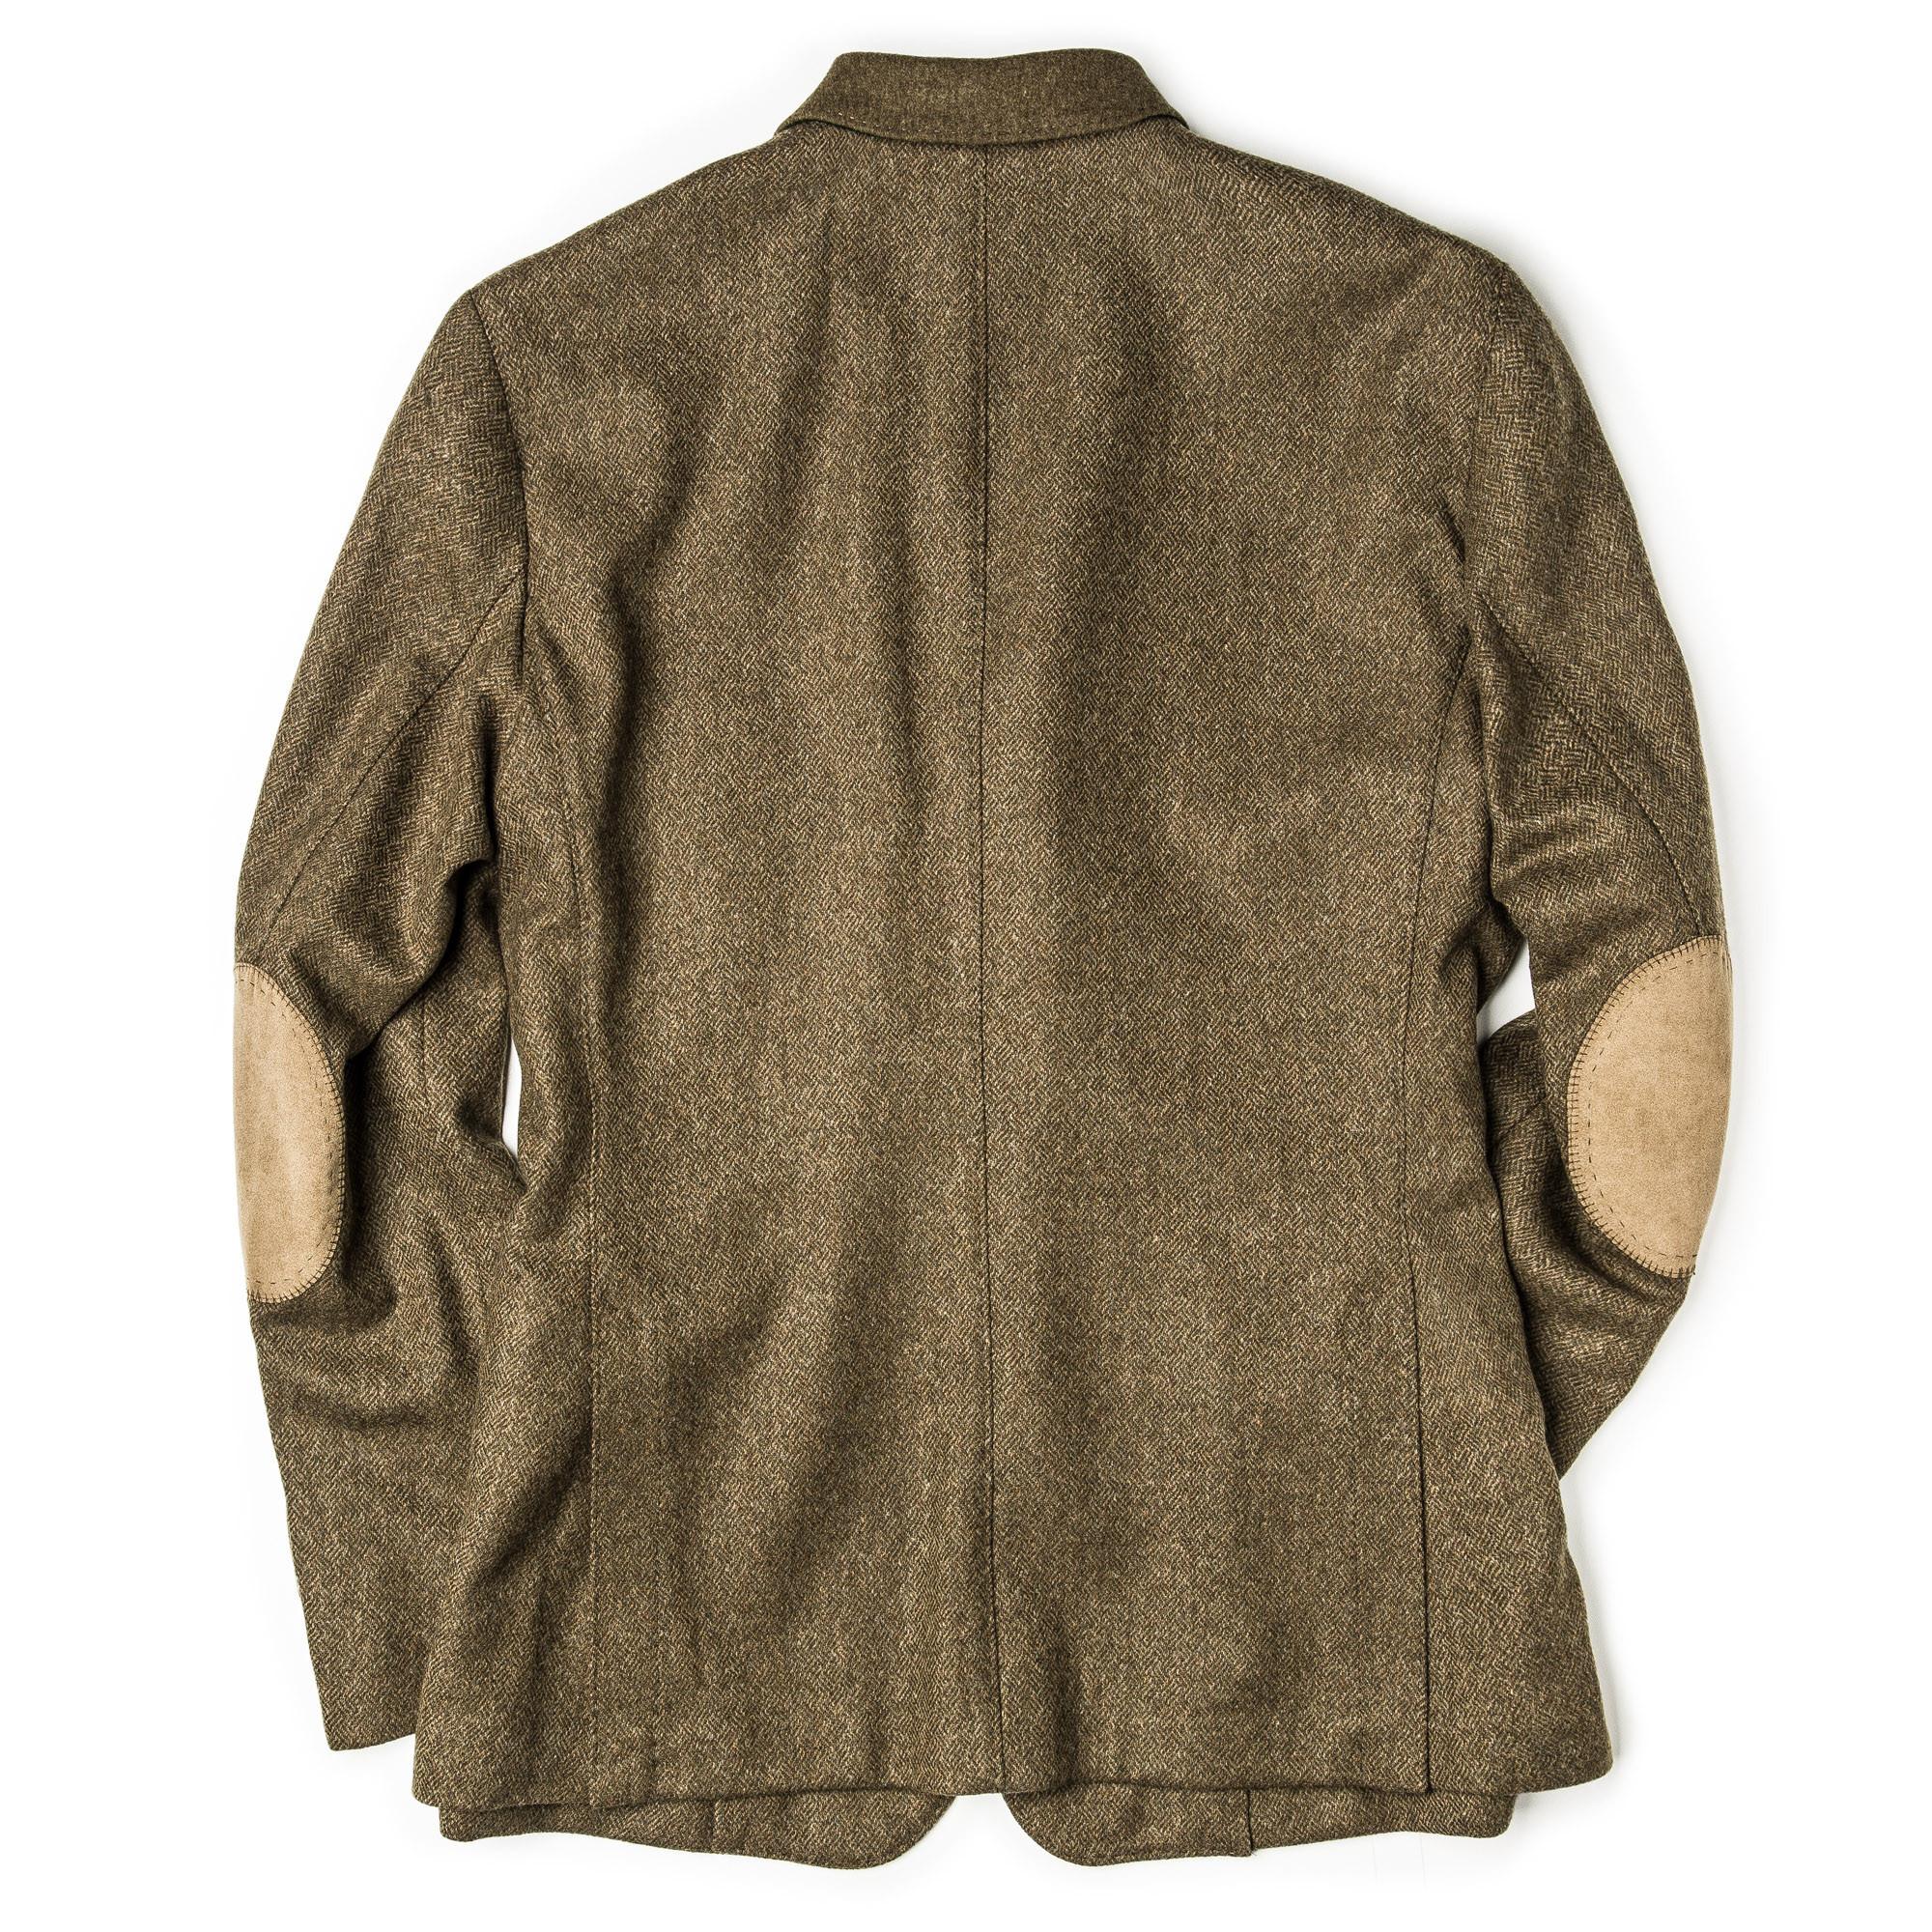 Habsburg - Men's Edgar Tweed Jacket | W.R. & Co Ltd